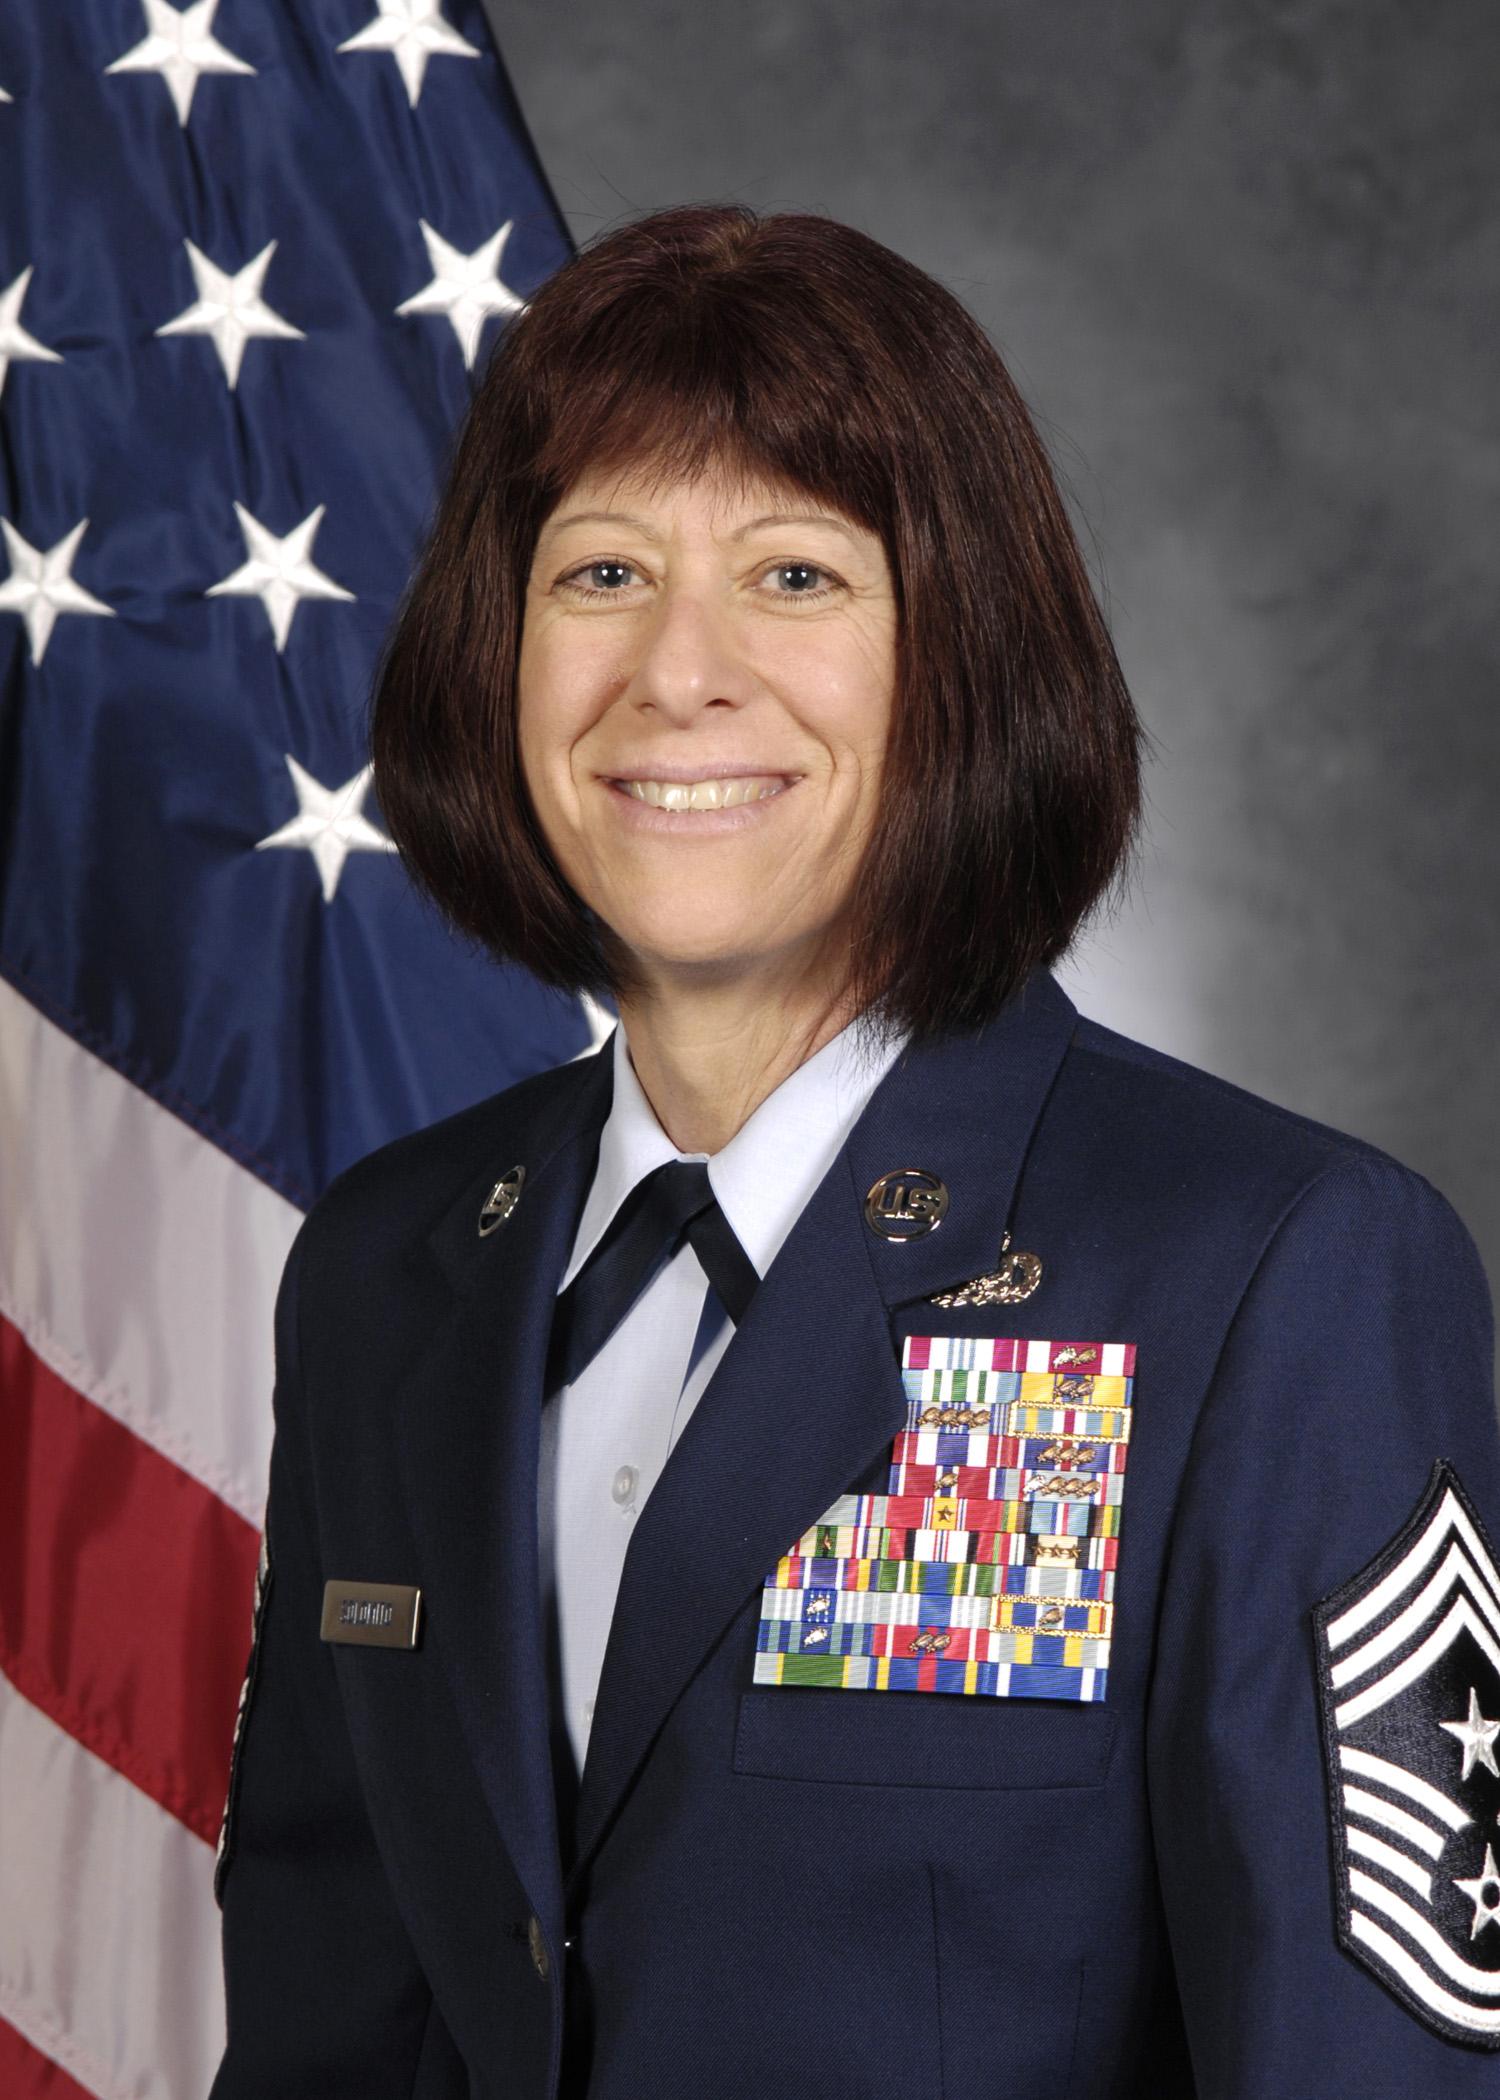 Chief Master Sgt Cynthia M Solomito